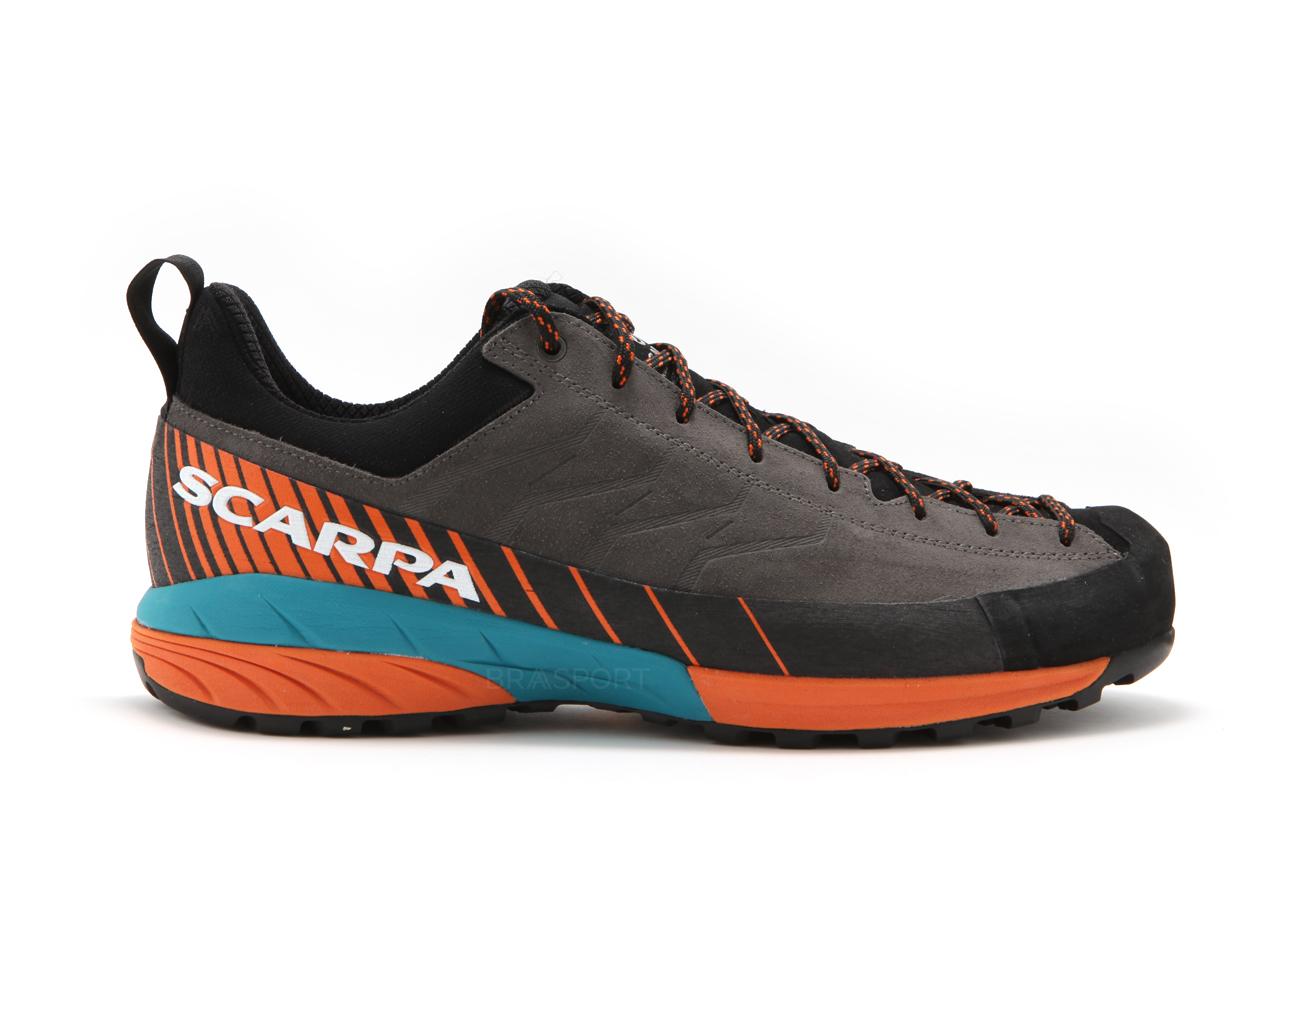 scarpa_mescalito_herre1.jpg